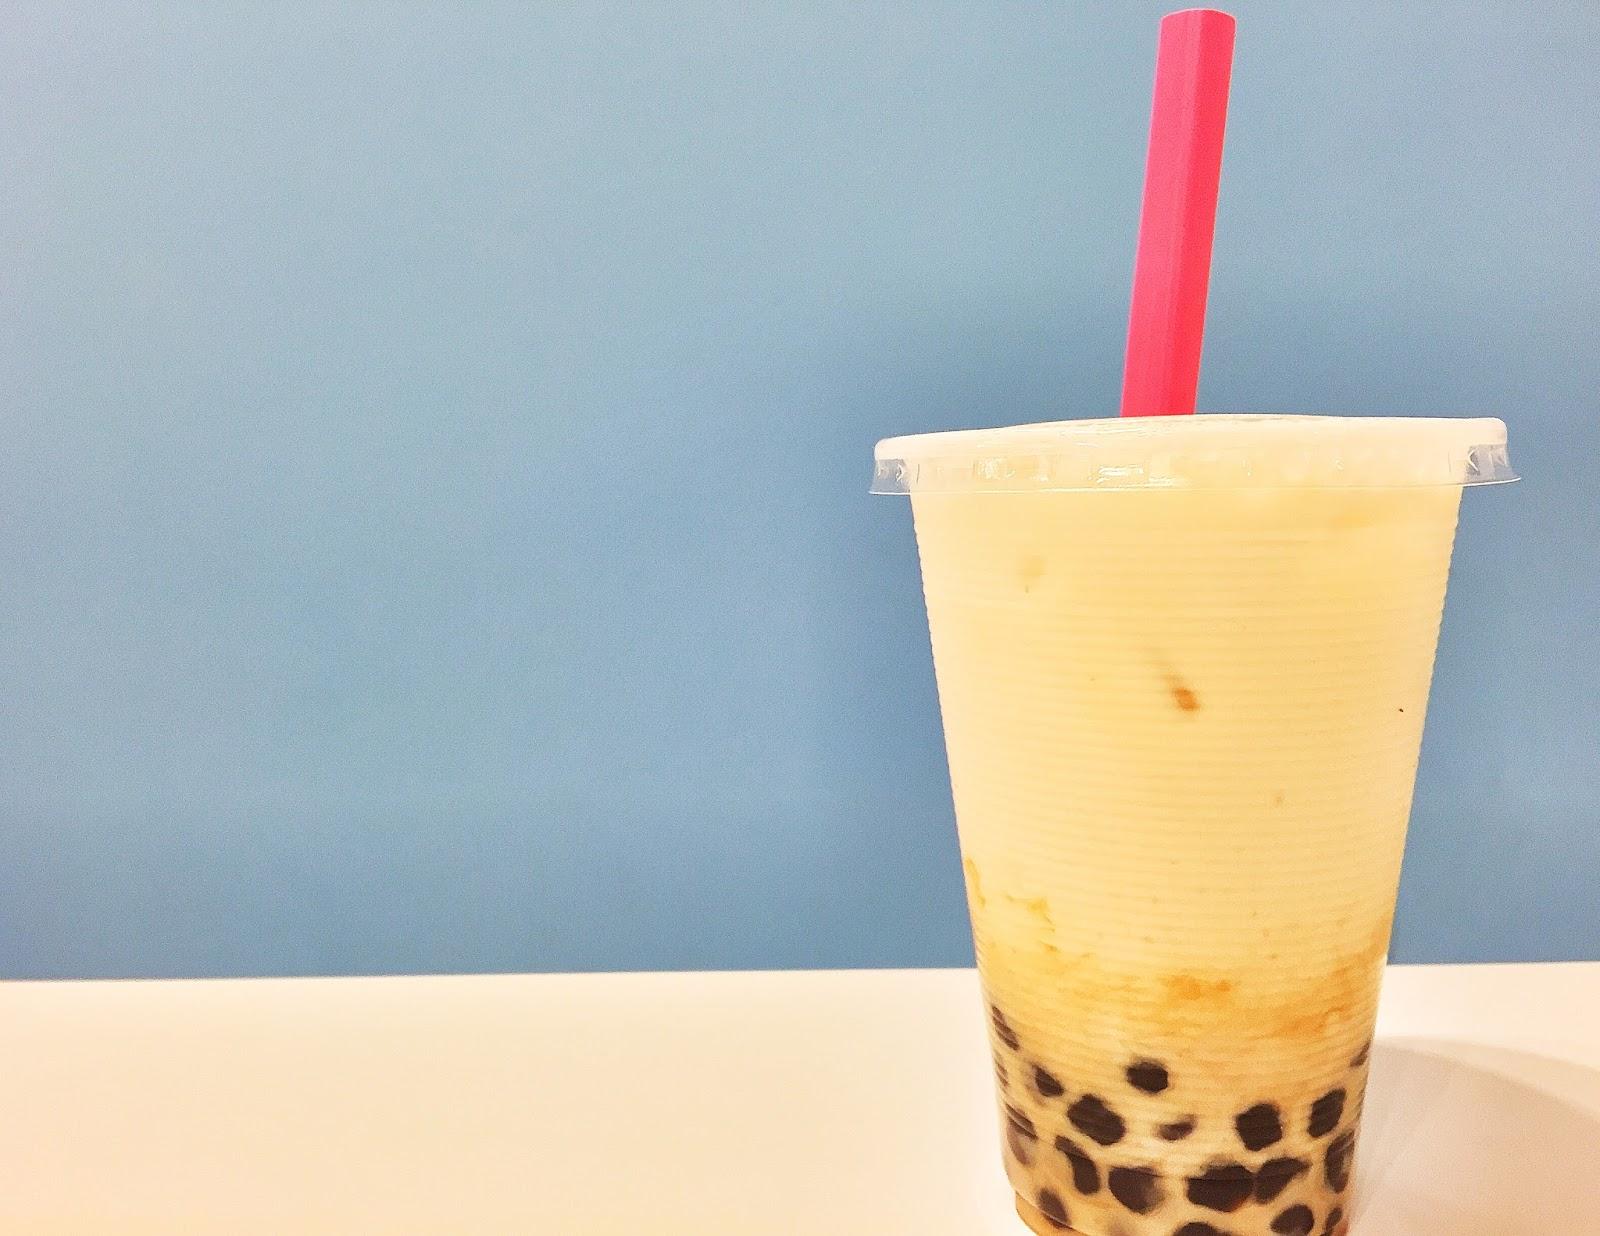 Yi Li Pao Pao - 青蛙撞奶 Frog Bang Milk